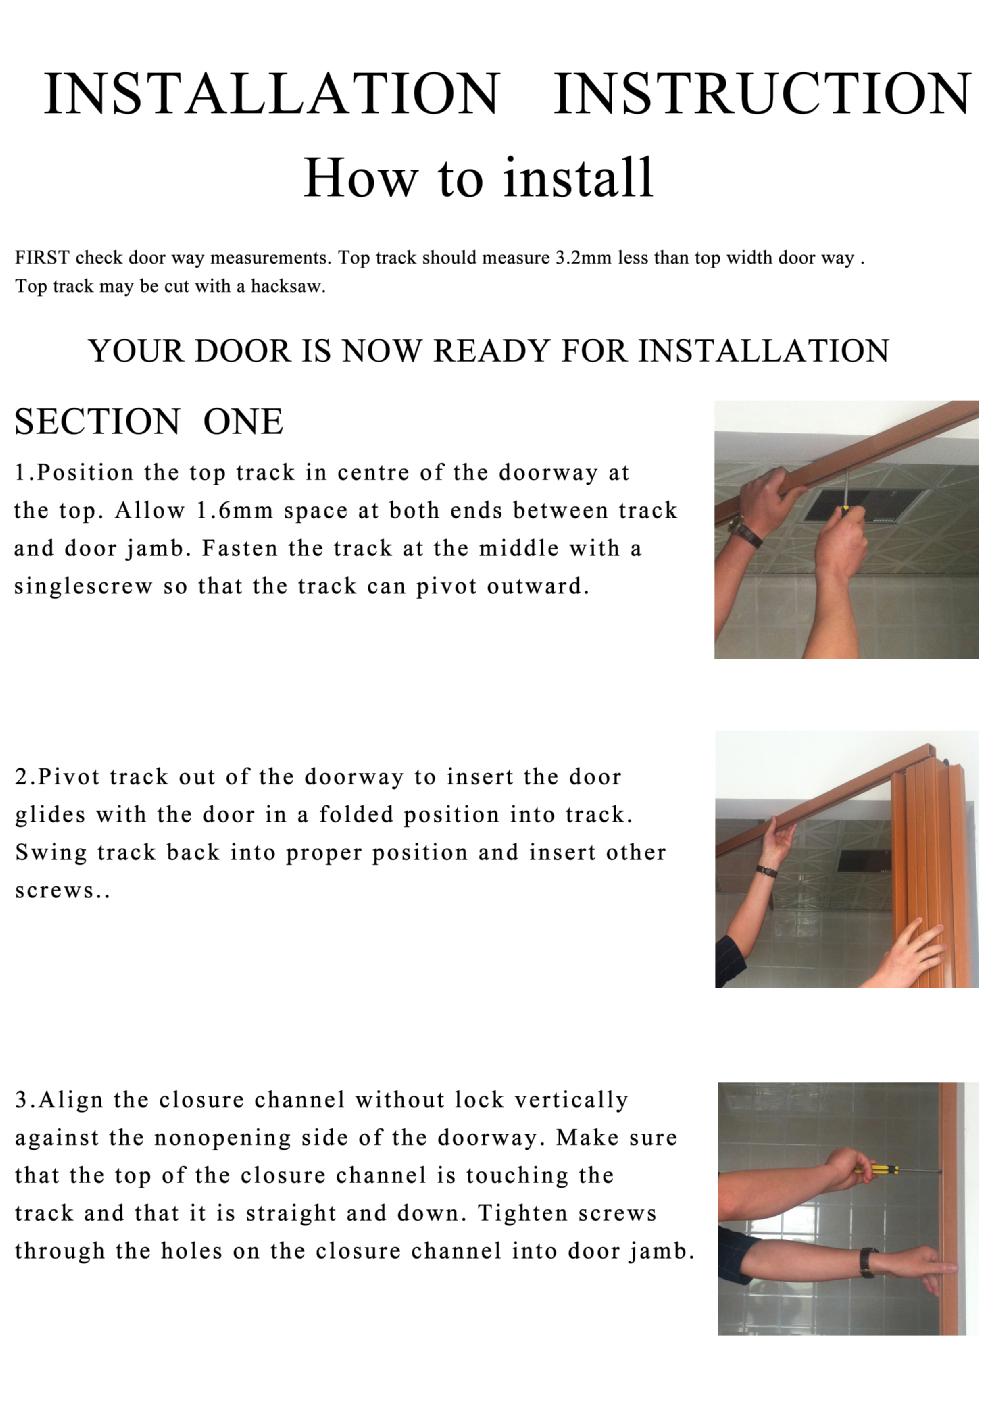 How to install a sliding bathroom door - Bathroom Pvc Sliding Accordion Door With Lock